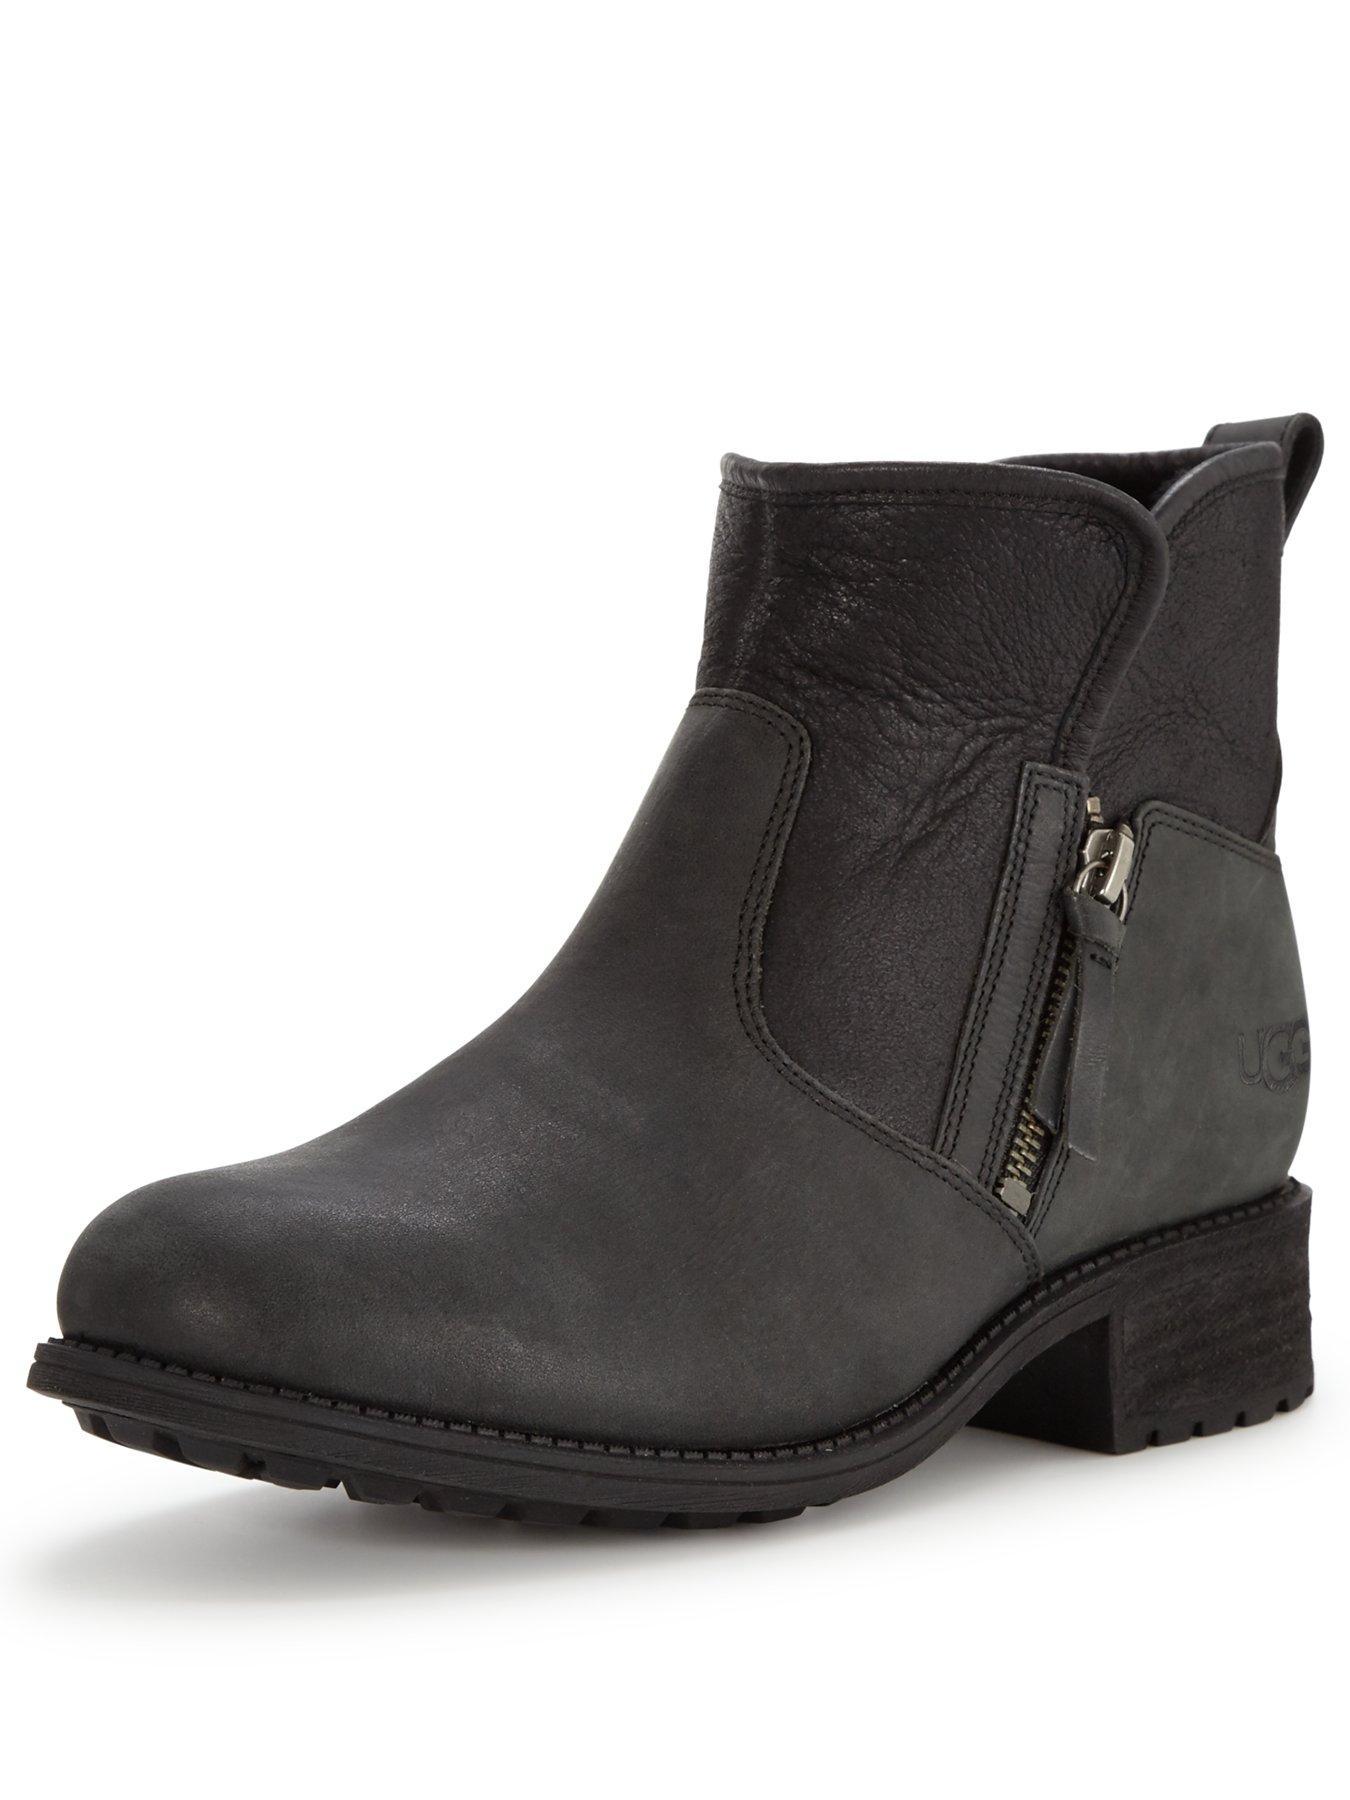 ugg australia boots in dubai